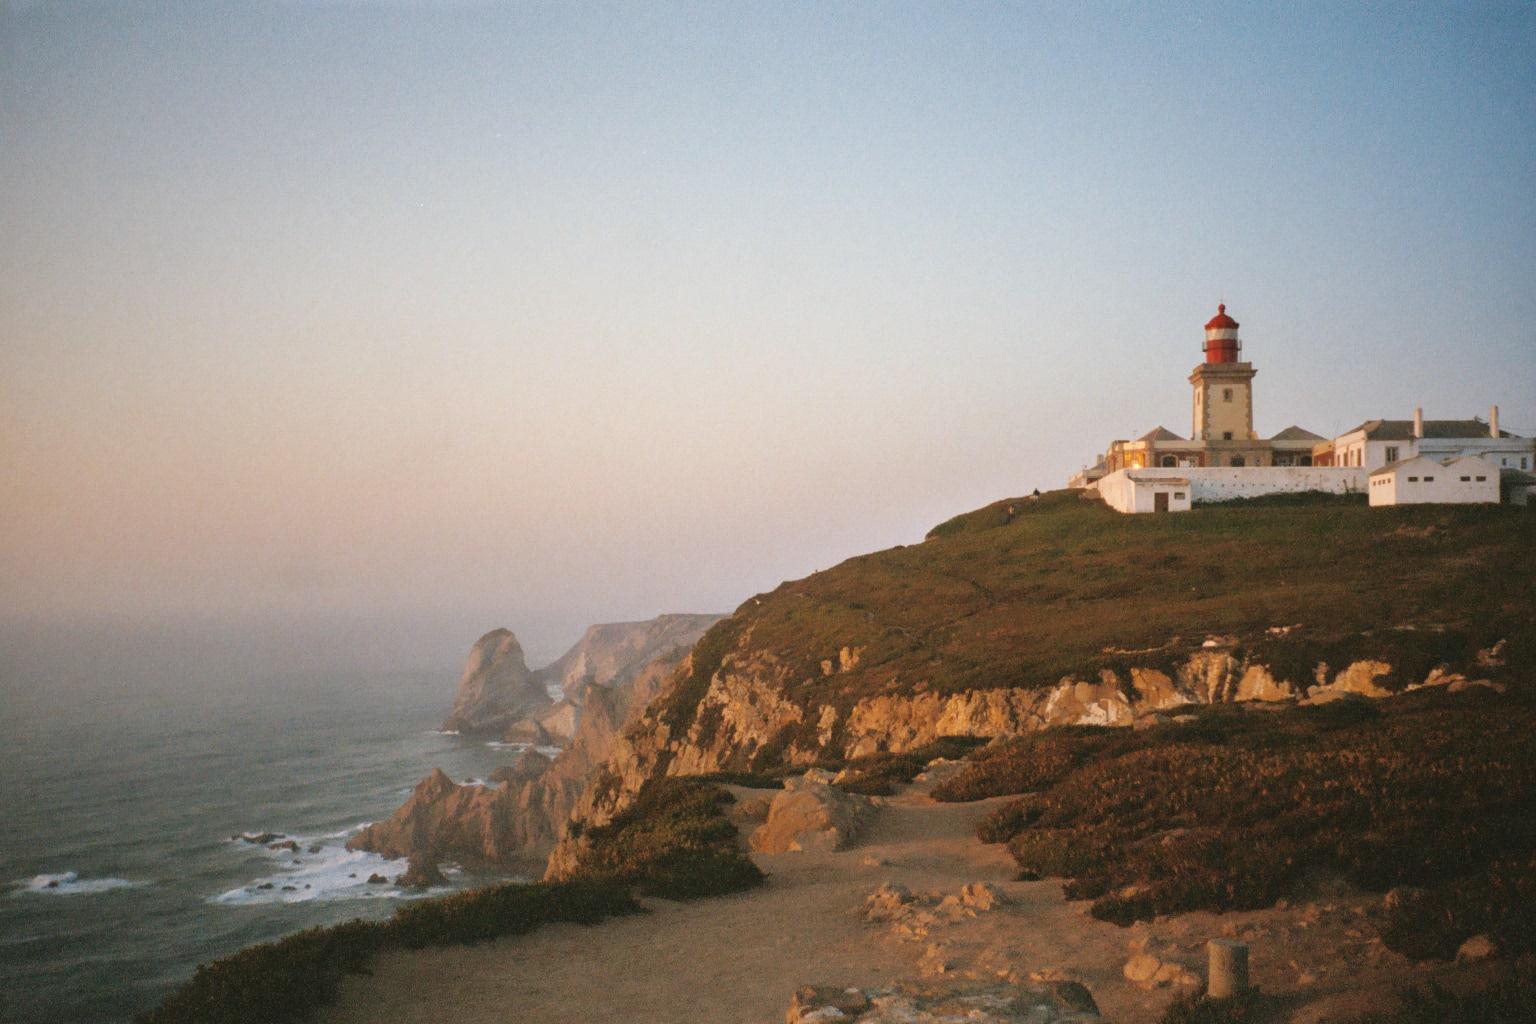 [Imagen: Cabo_da_Roca_lighthouse.JPG]